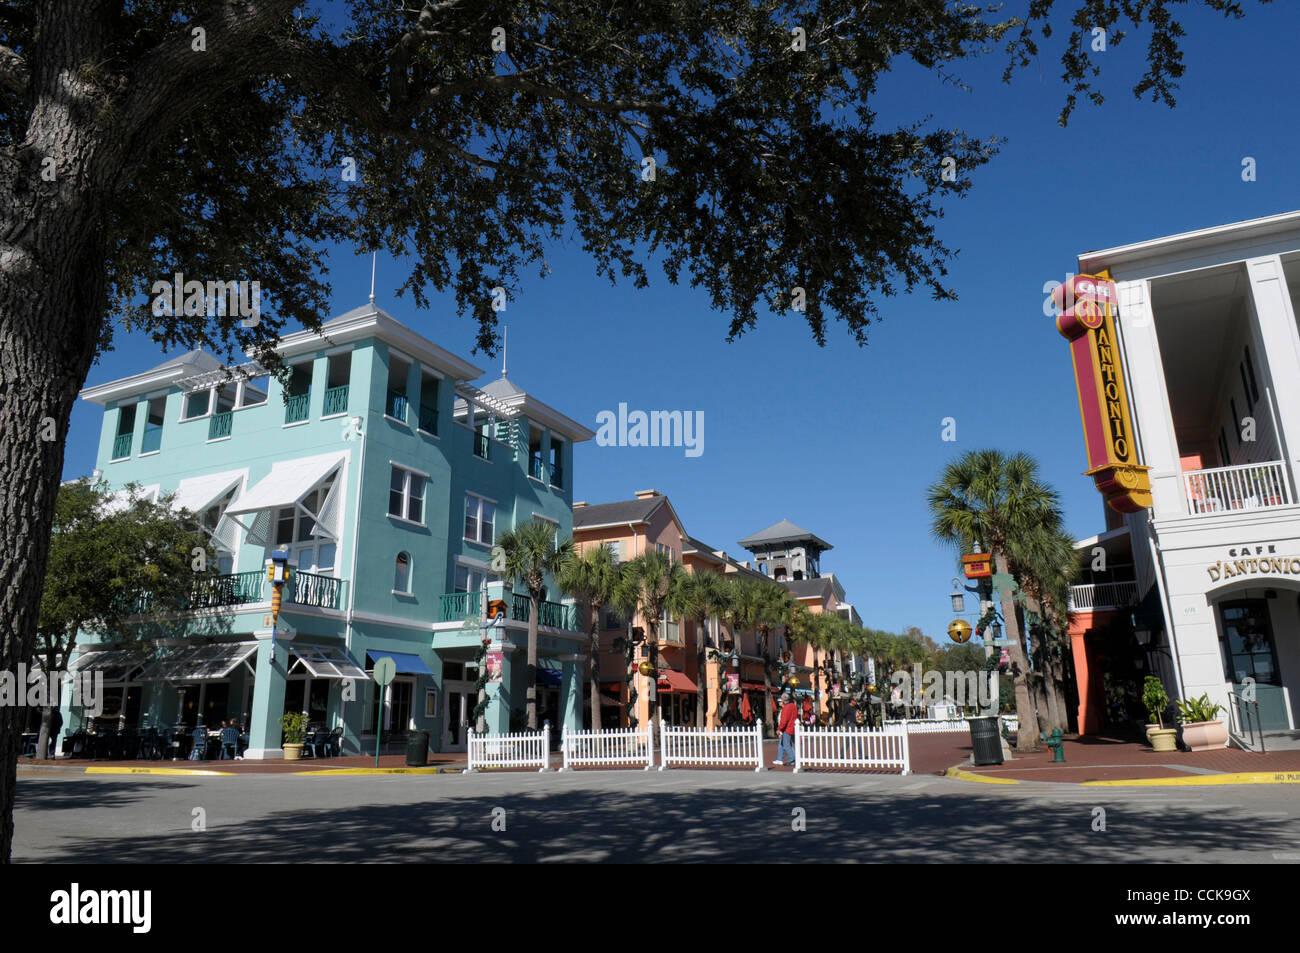 Dec 03 2010 Celebration Florida U S Shops And